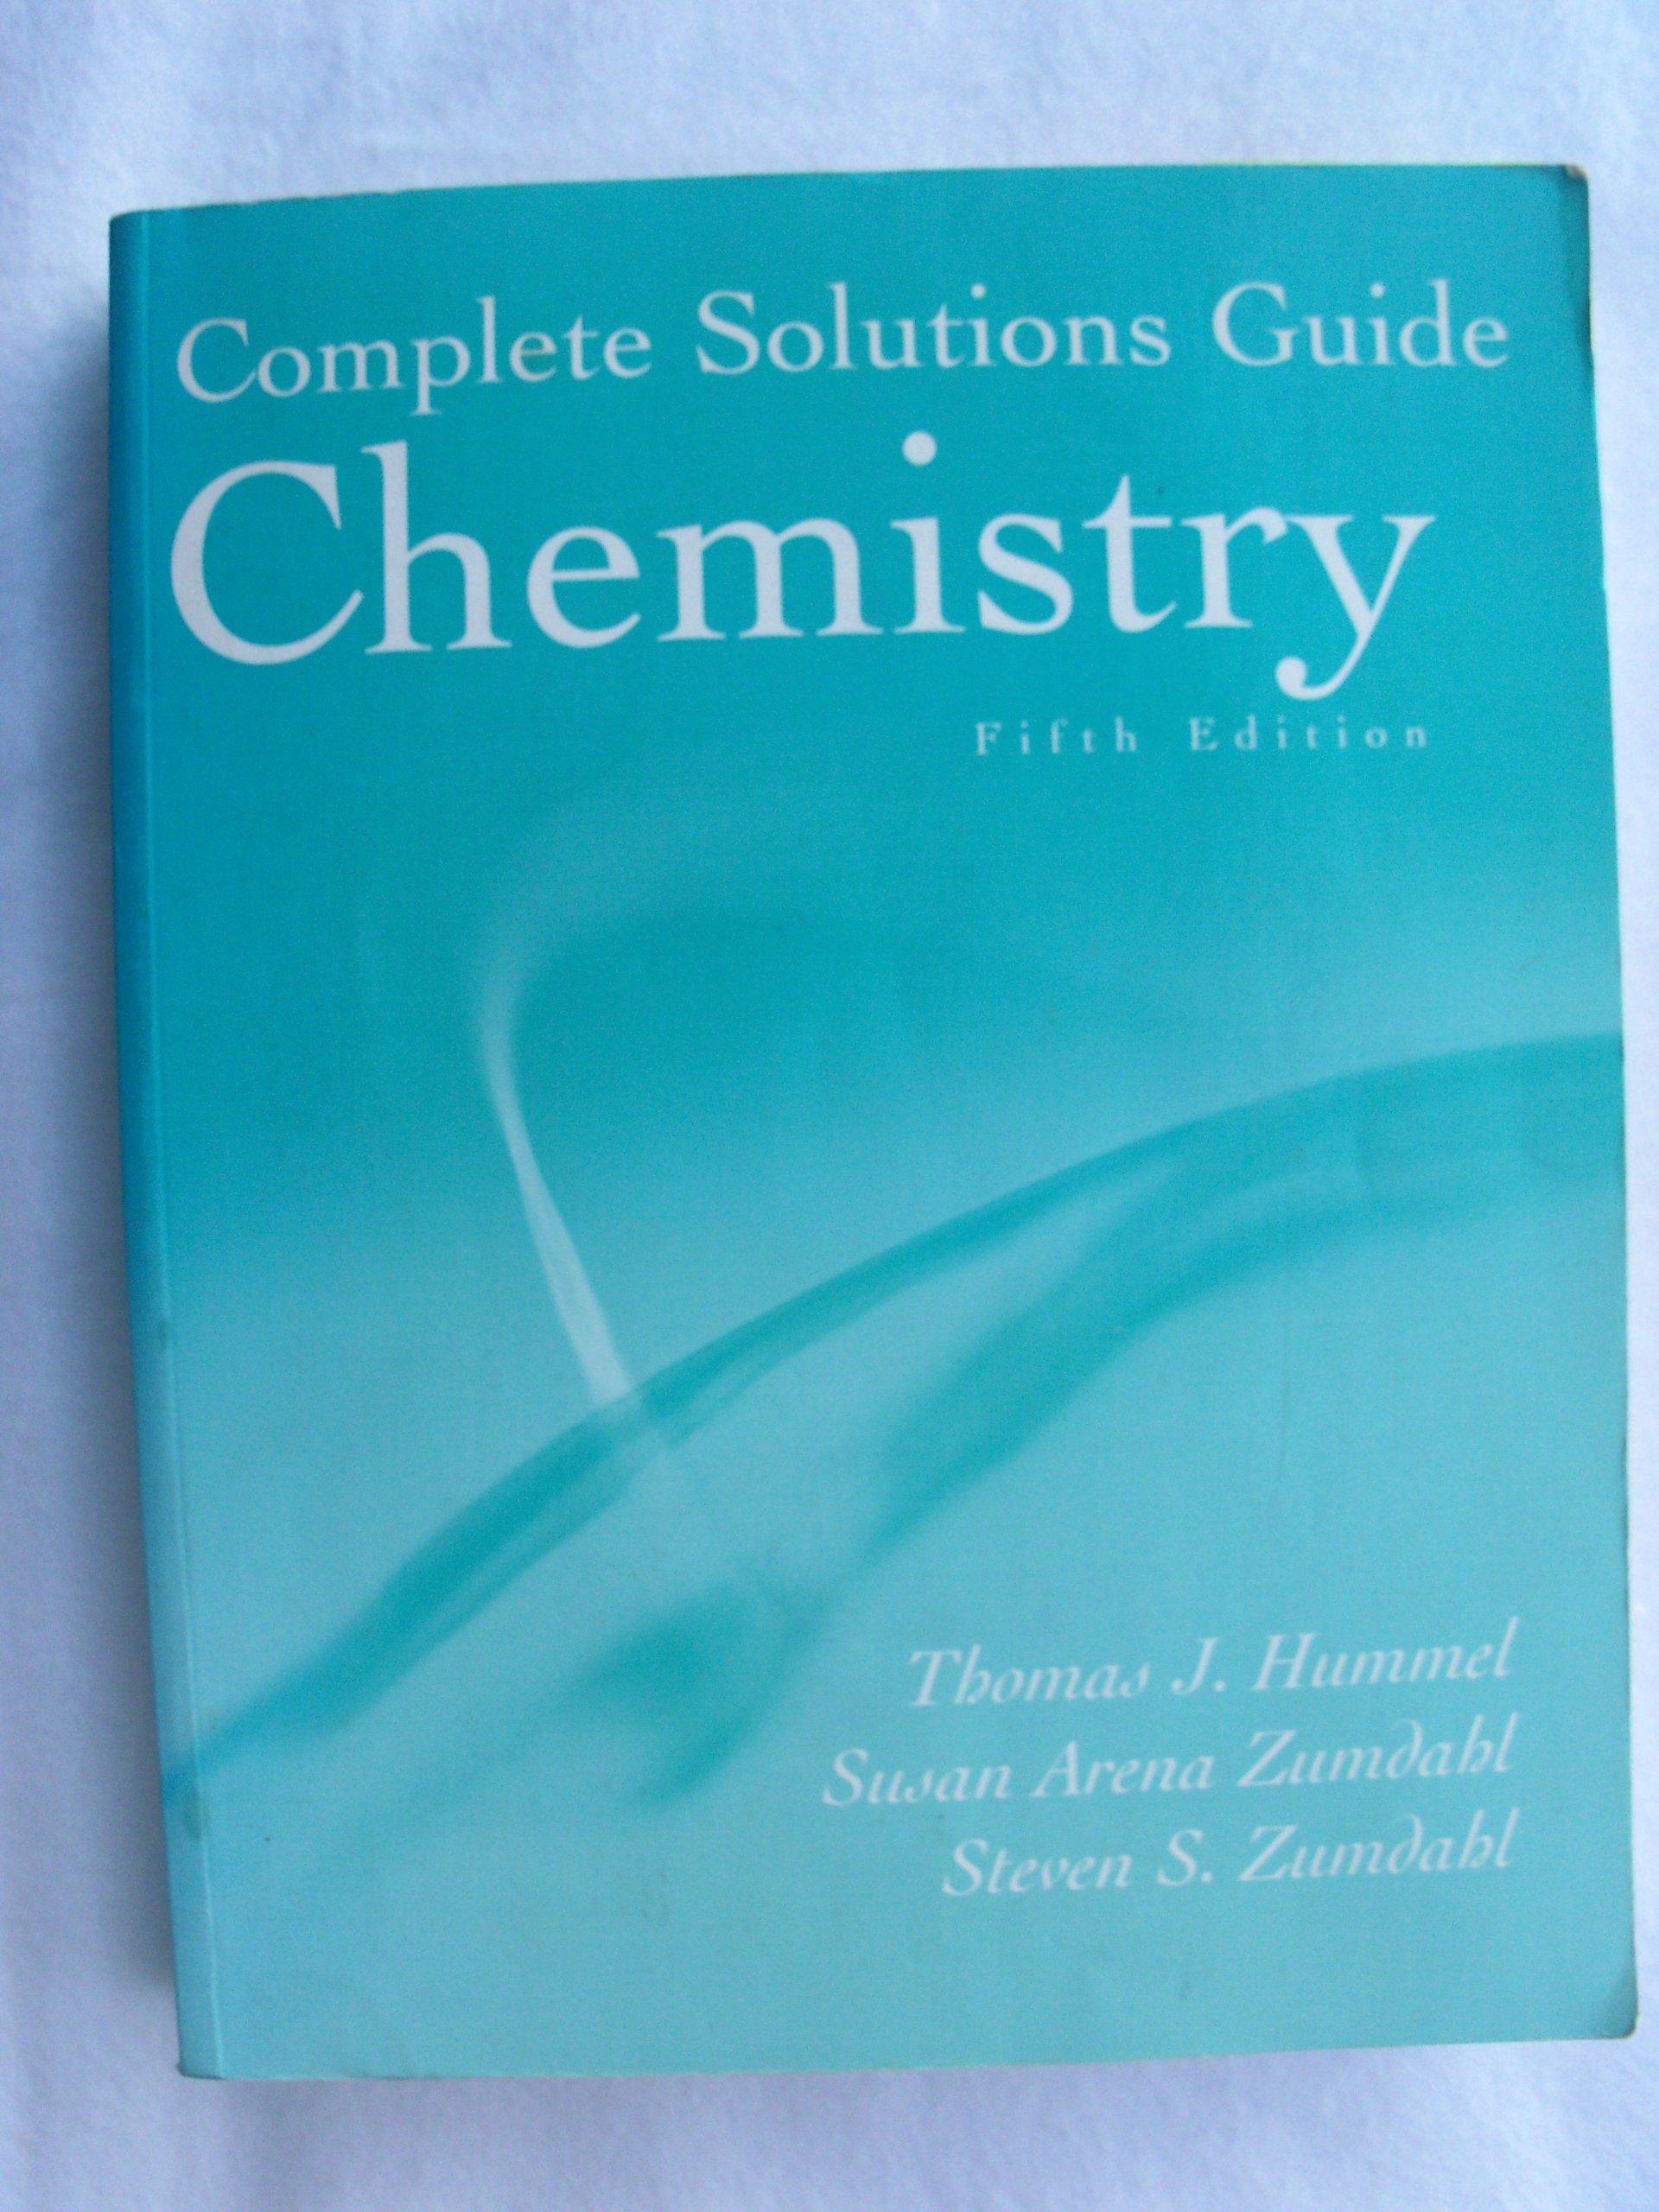 Chemistry: Complete Solutions Guide: Thomas J. Hummel, Susan A. Zumdahl,  Steven S. Zumdahl: 9780395985892: Amazon.com: Books